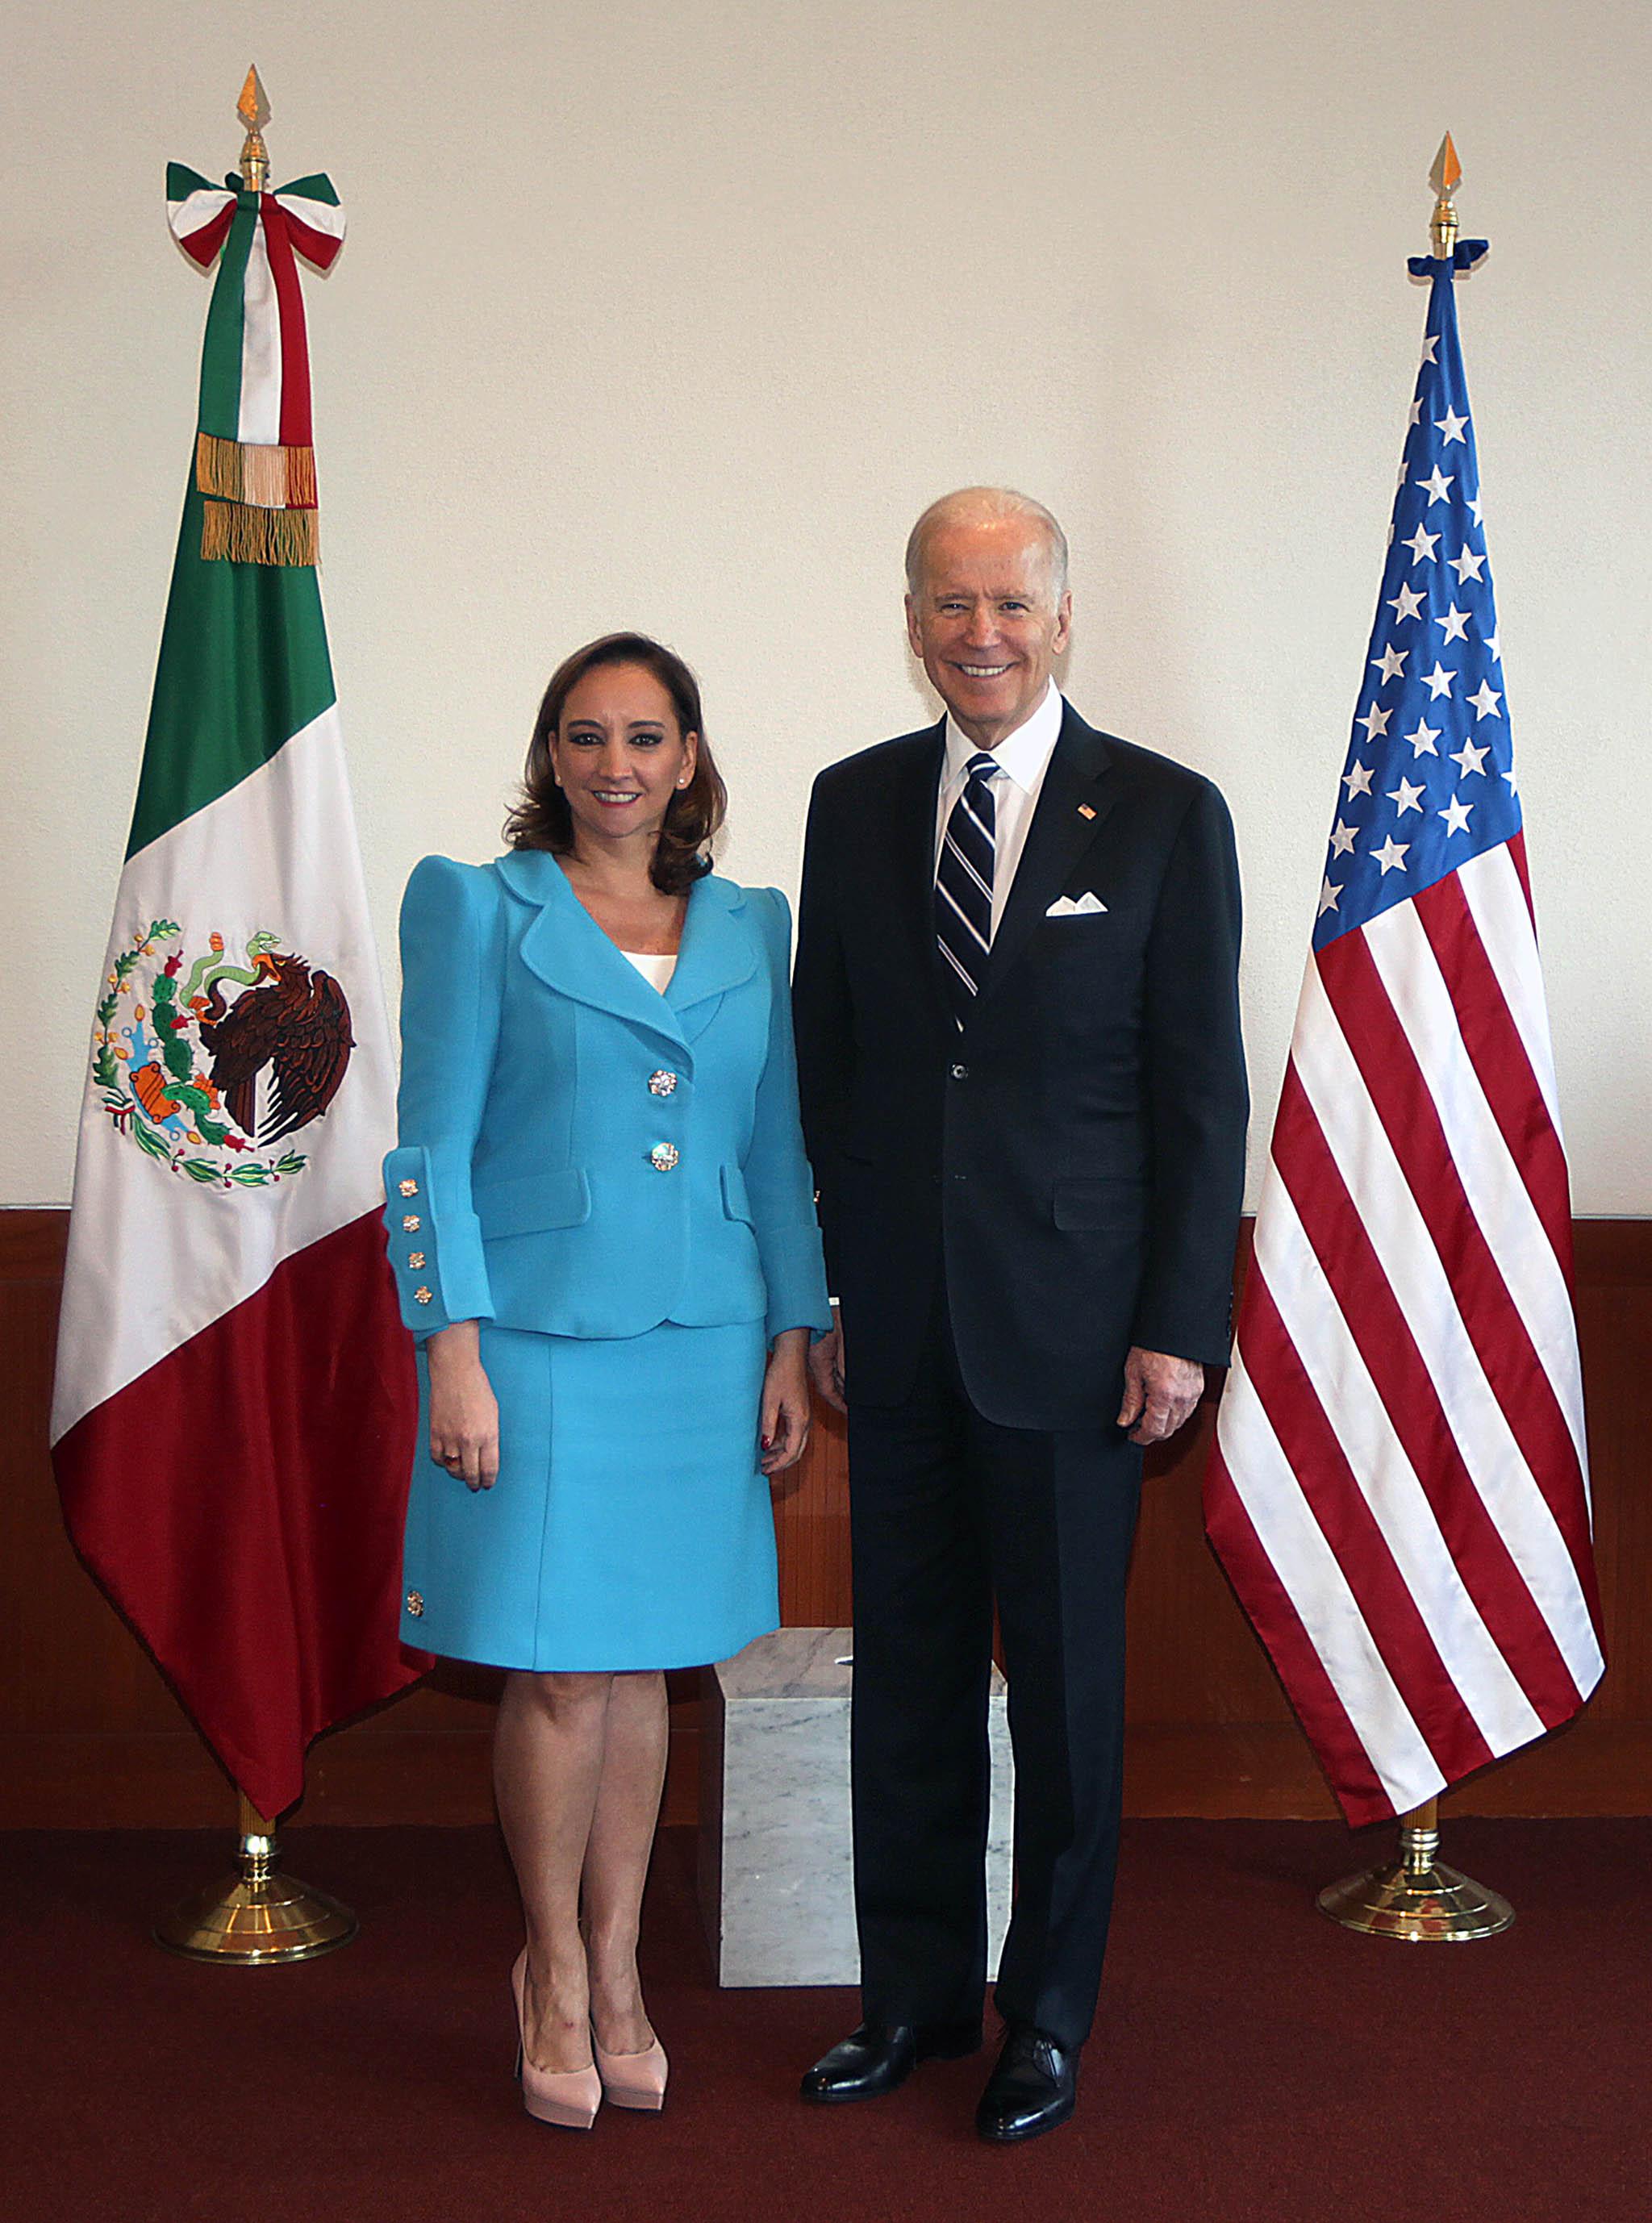 FOTO 1 Canciller Claudia Ruiz Massieu recibi  al Vicepresidente de Estados Unidos  Joseph Bidenjpg